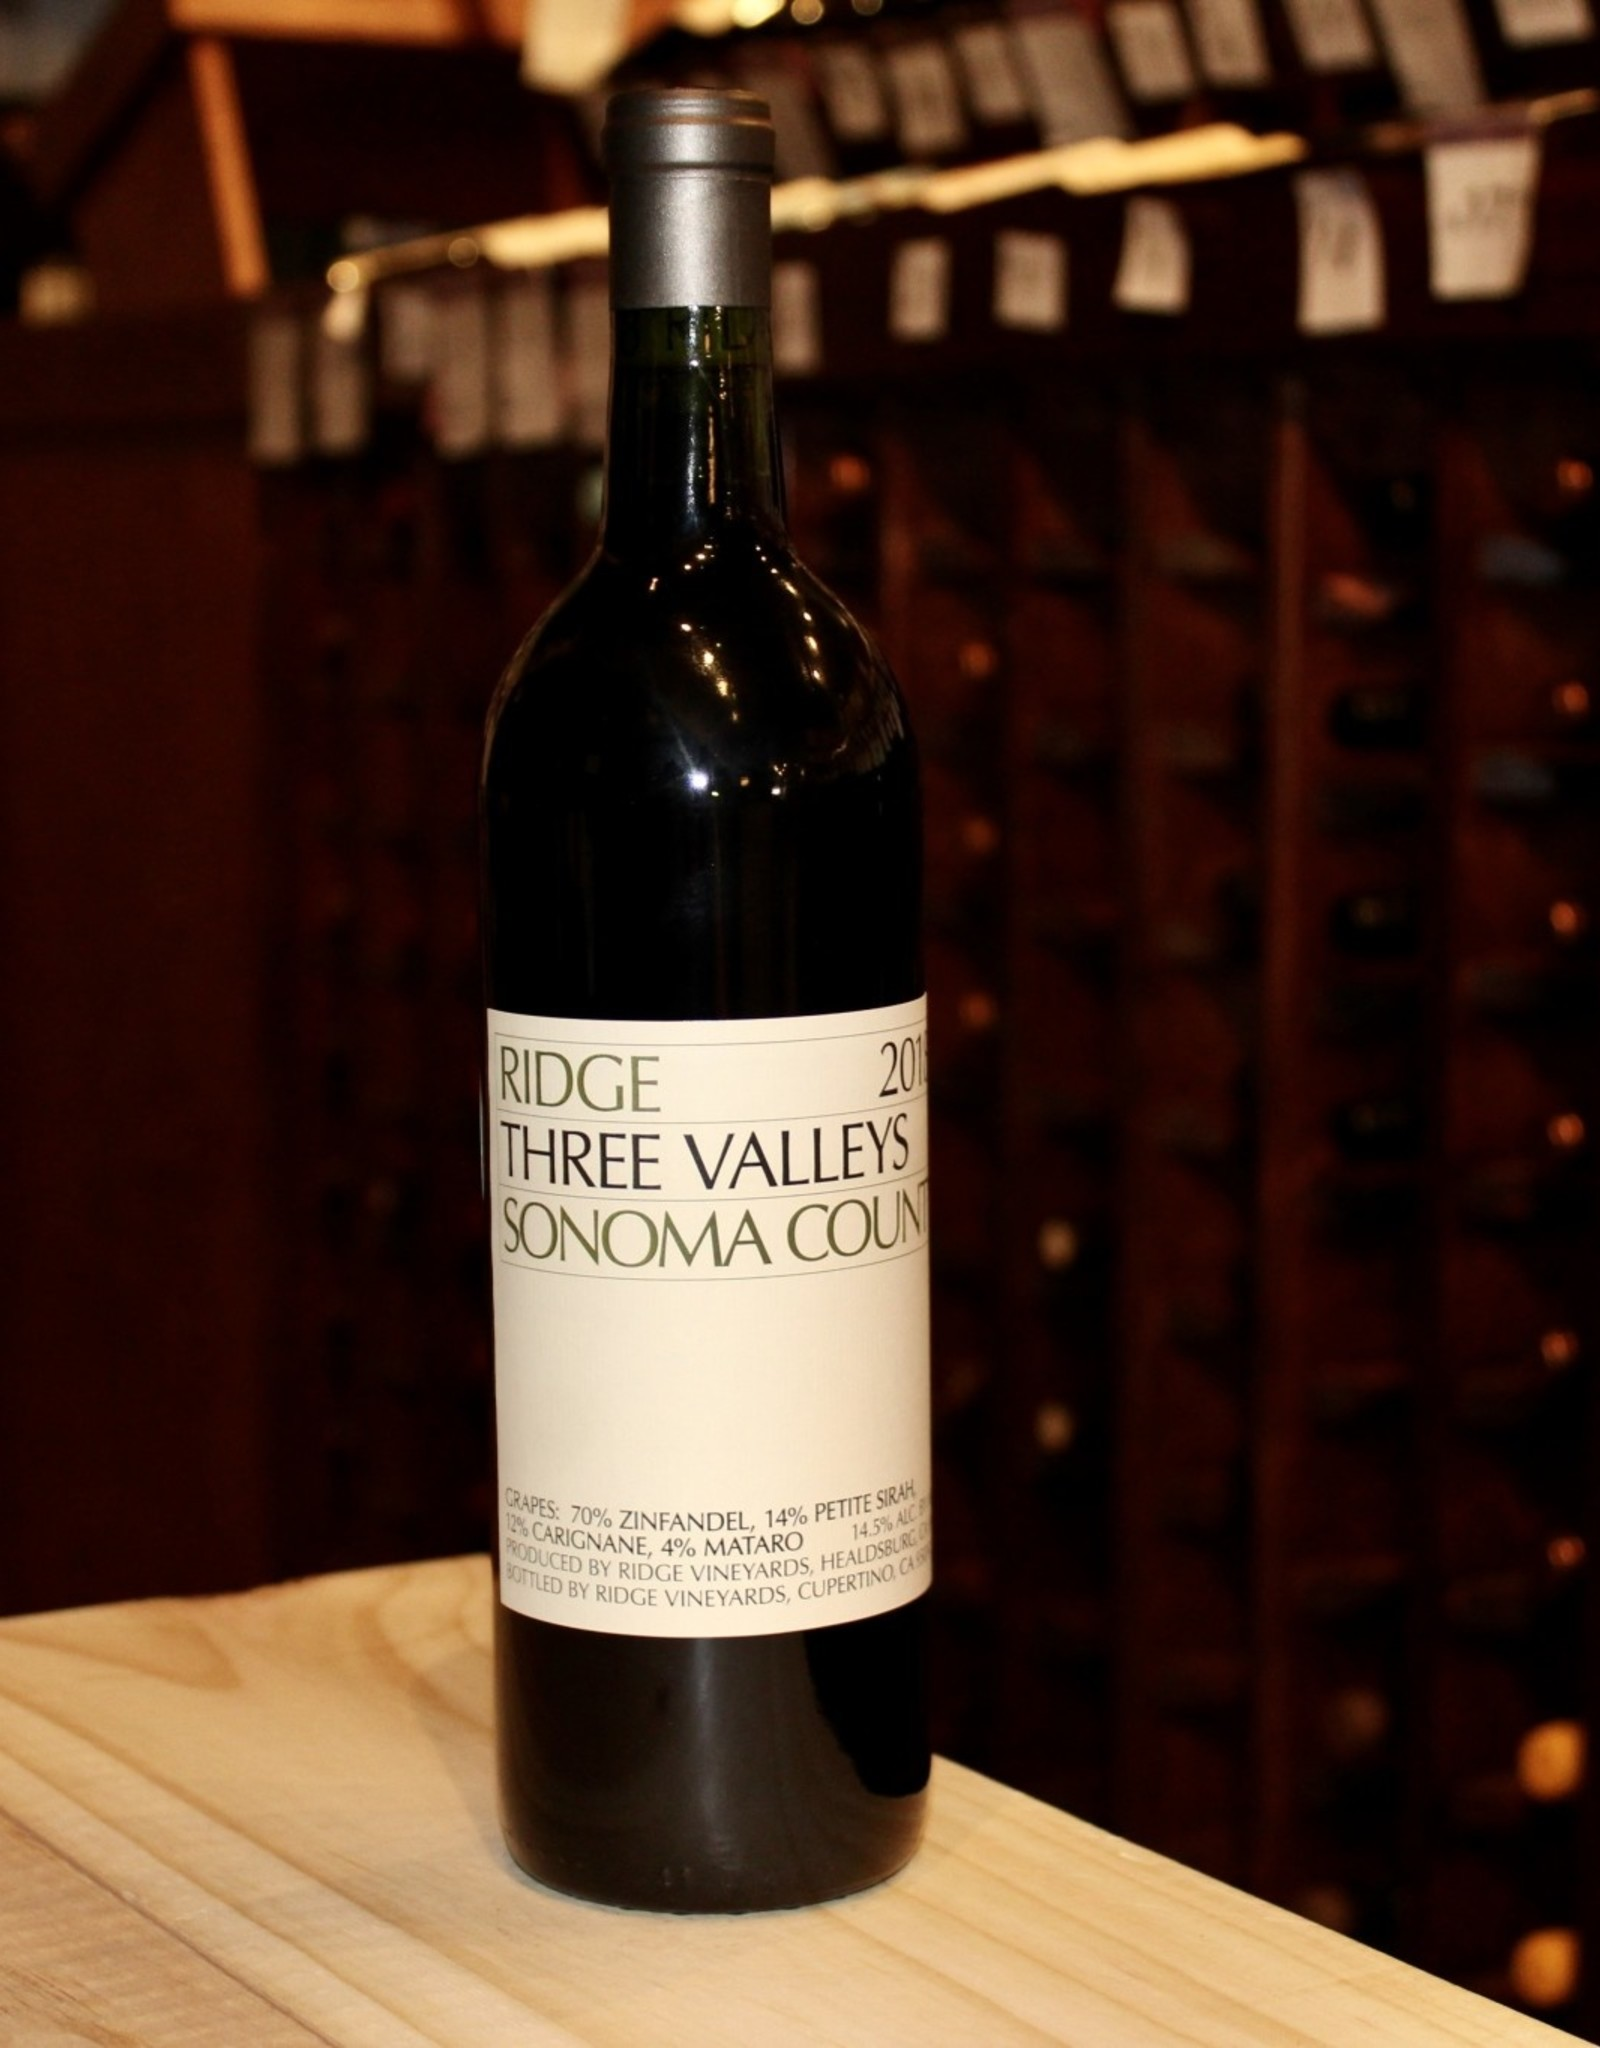 Wine 2018 Ridge Vineyards Three Valleys Zinfandel Blend - Sonoma County, CA (750ml)